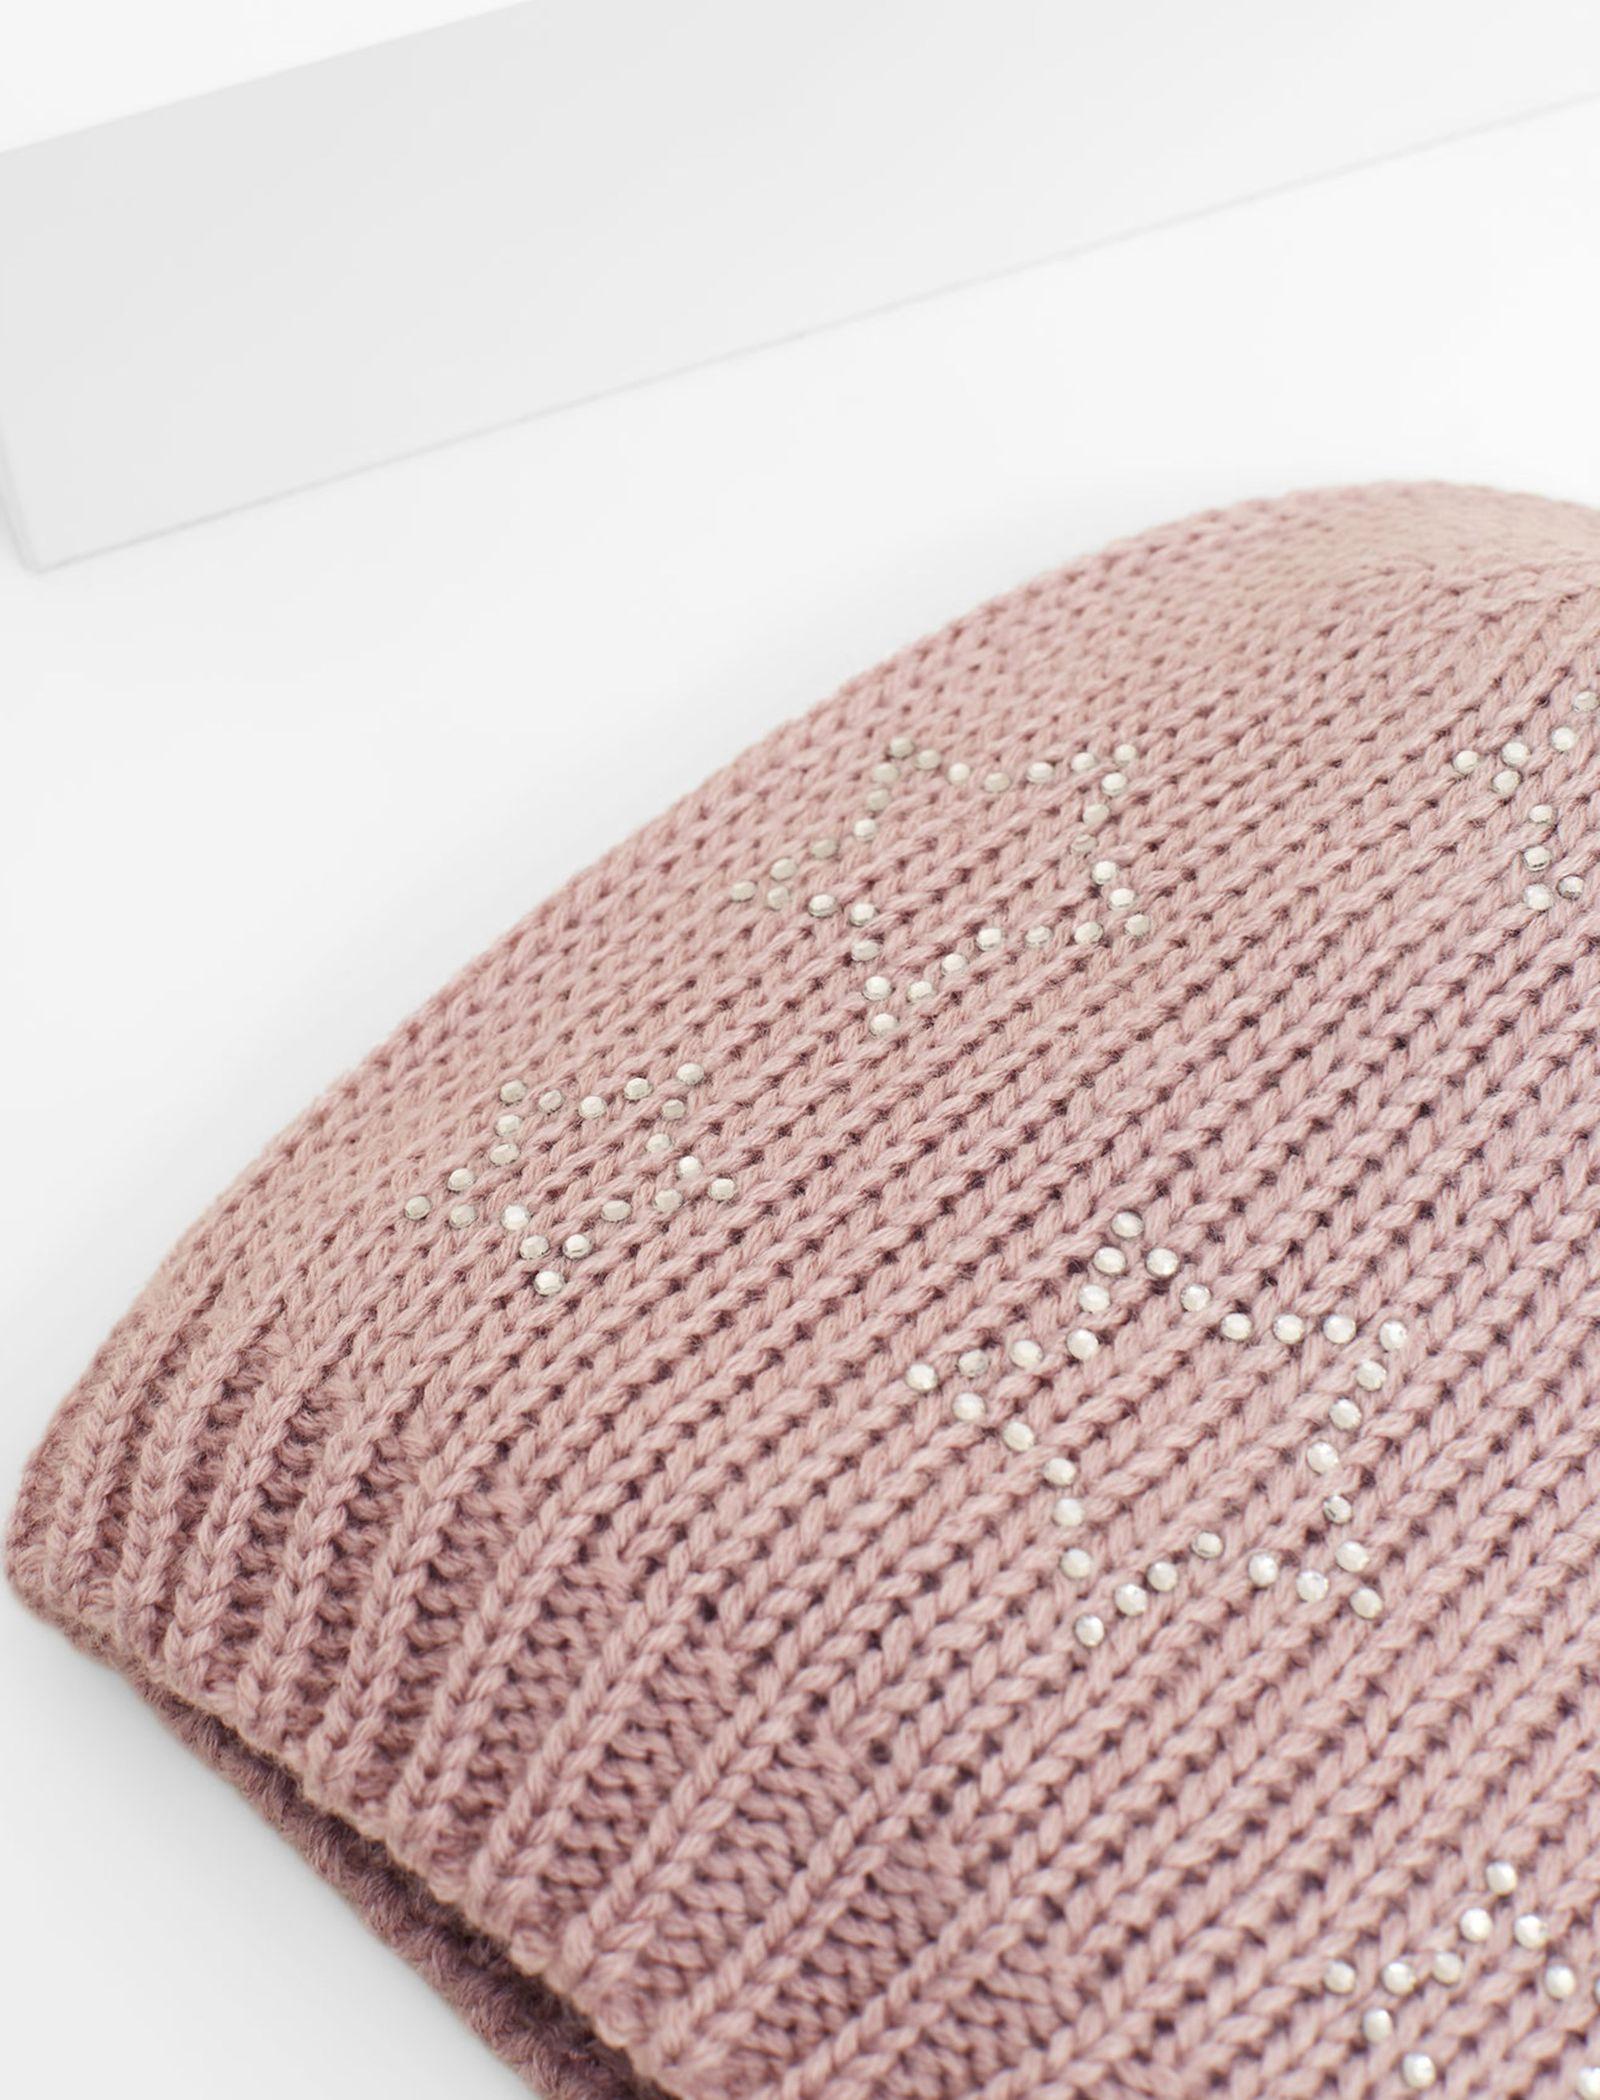 کلاه زمستانی دخترانه - مانگو - صورتي - 2